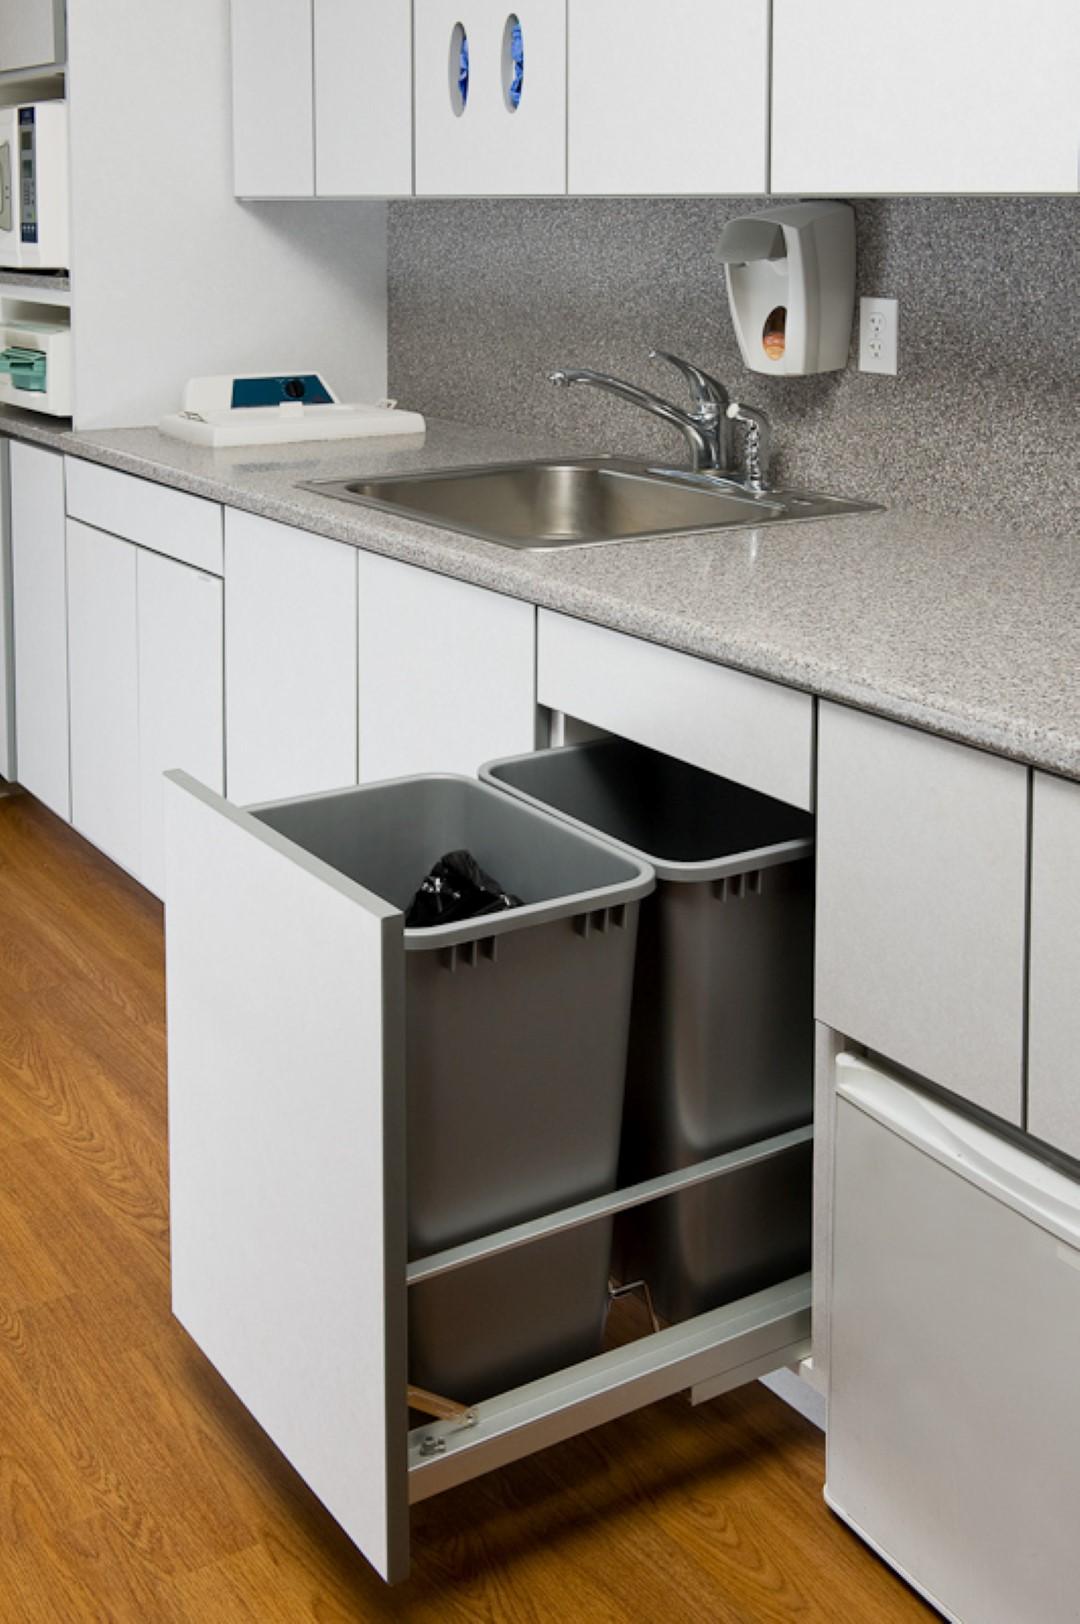 Cabinets-1007 (Large).jpg